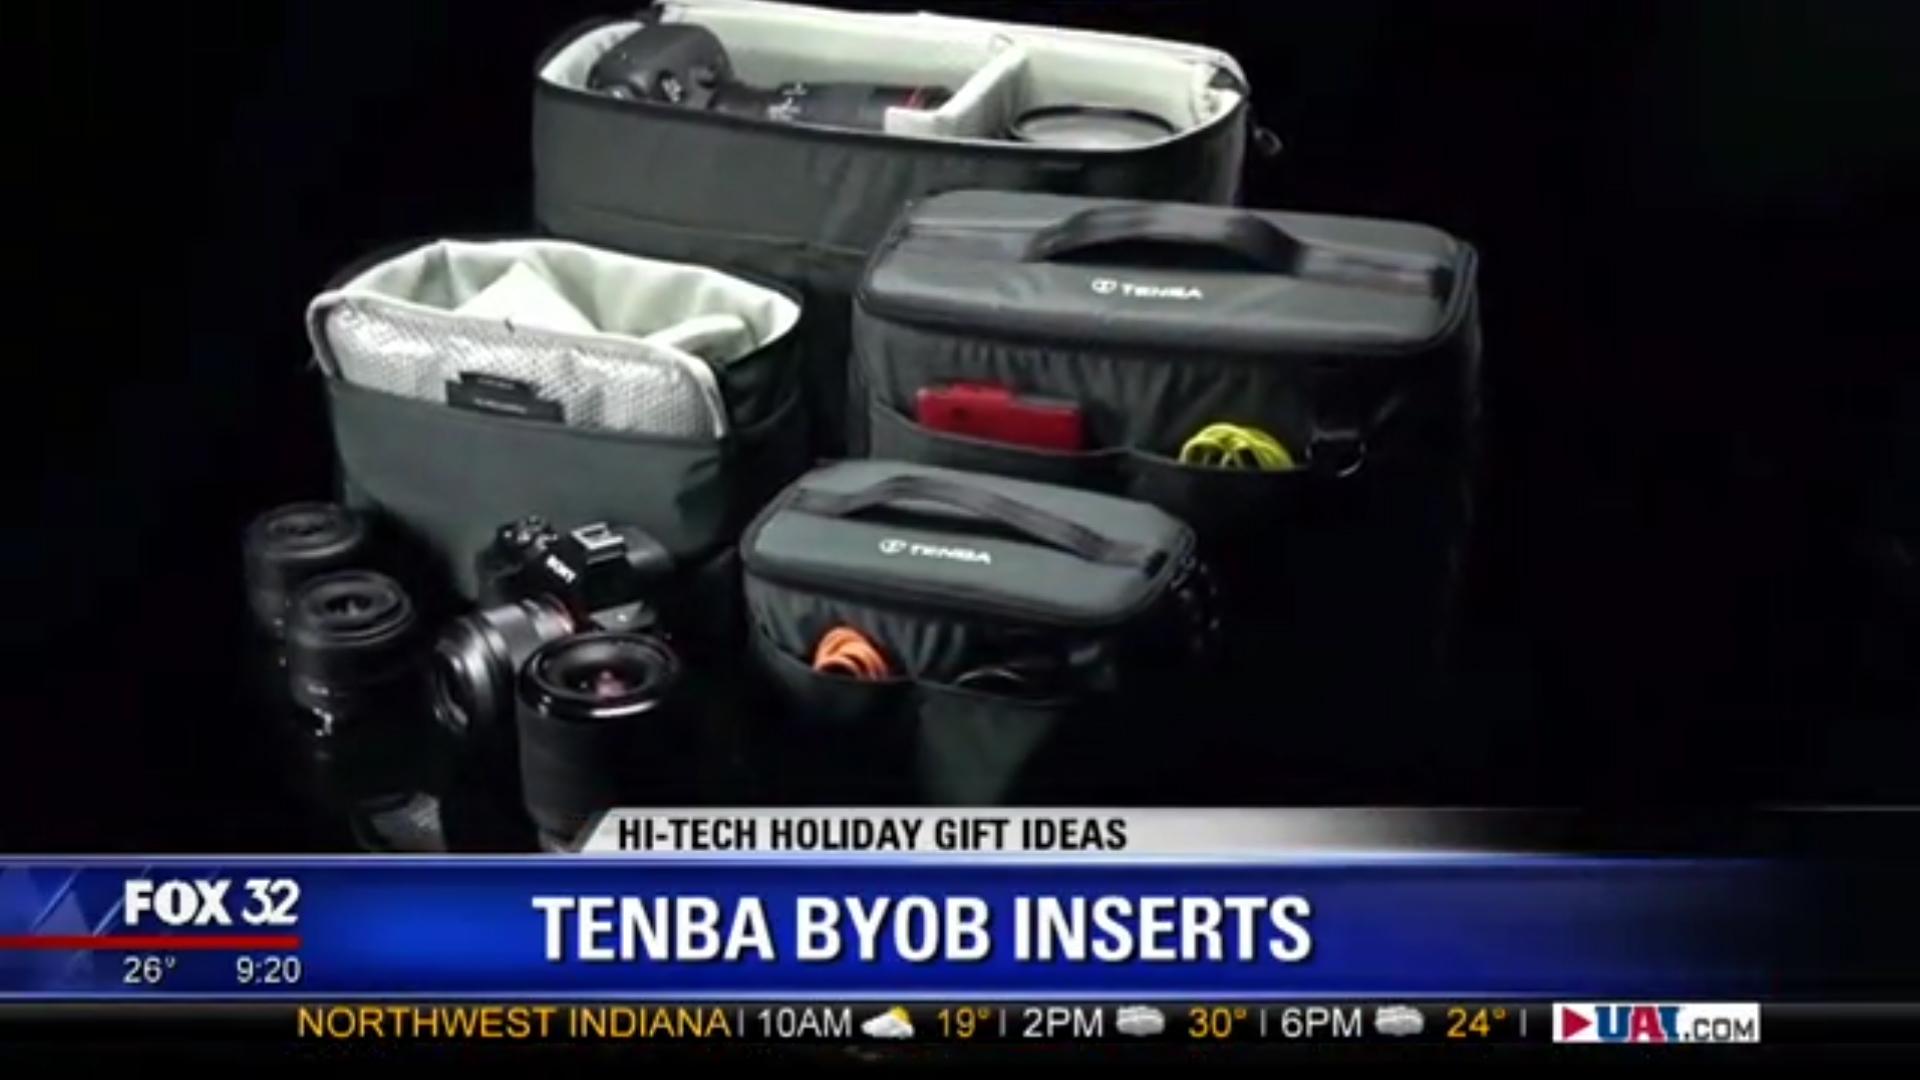 TENBA BYOB INSERTS - Starting at $39.95Shop Now